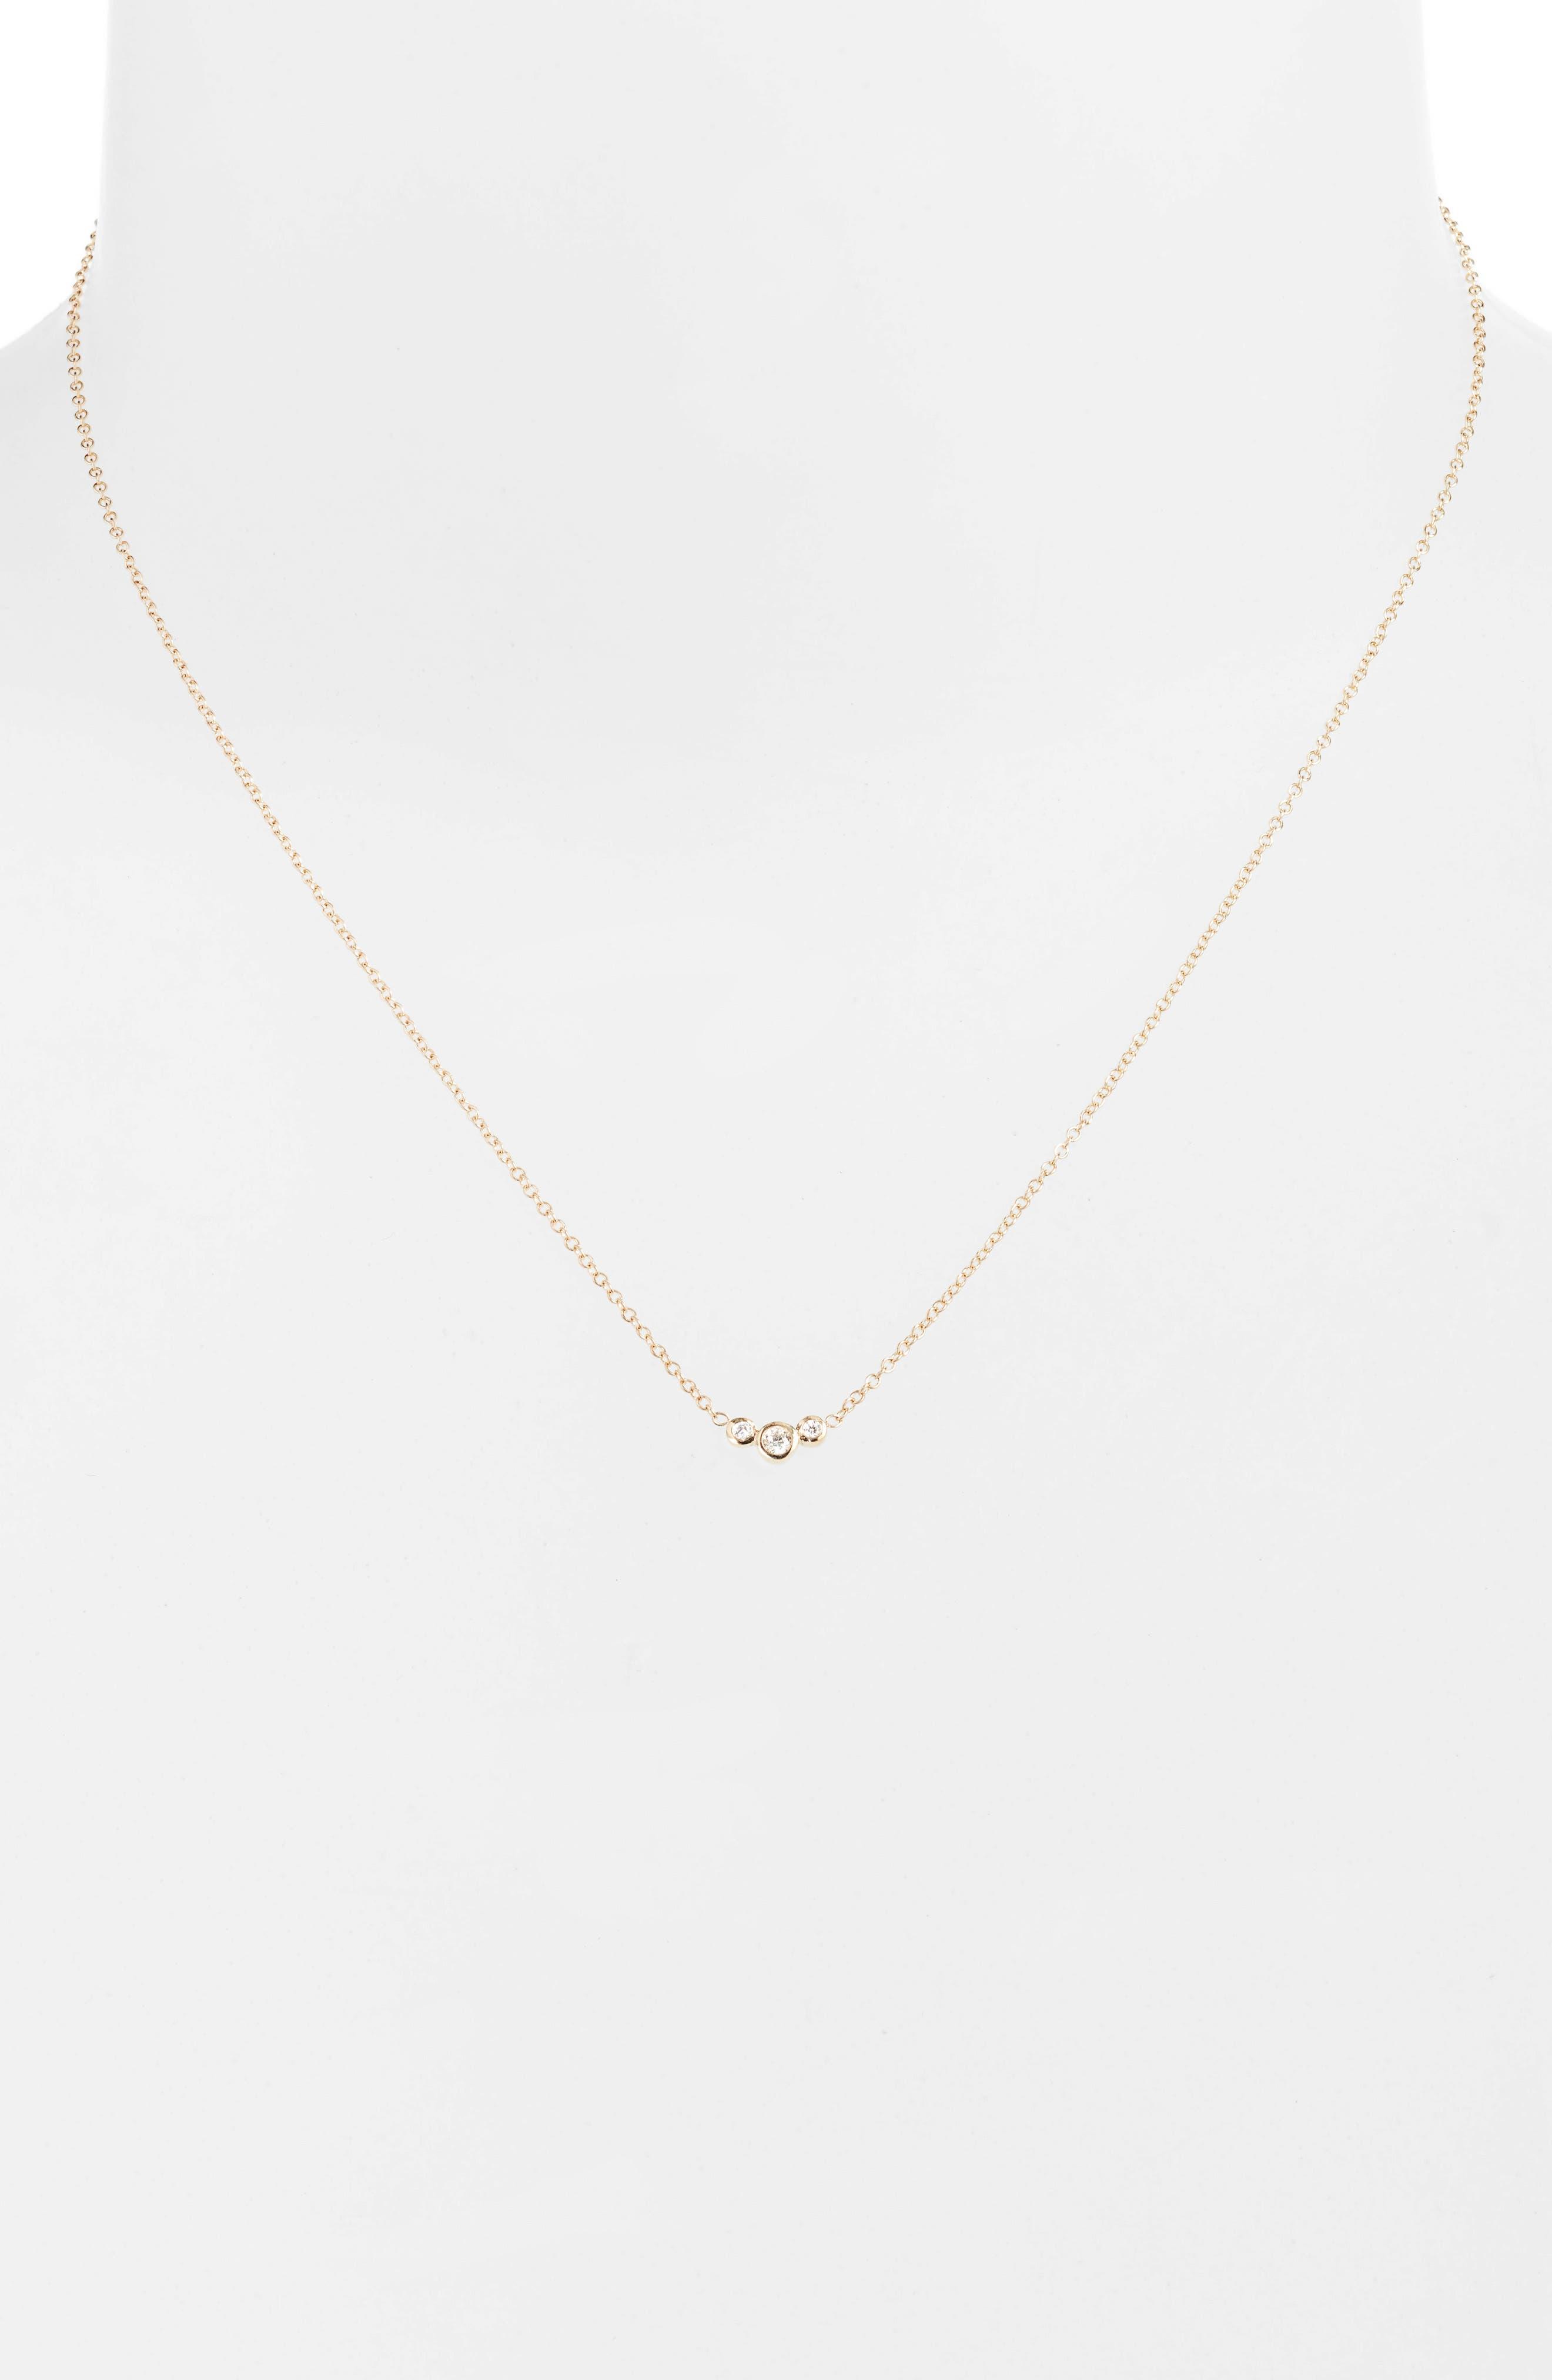 Curved 3-Diamond Bezel Pendant Necklace,                             Alternate thumbnail 2, color,                             YELLOW GOLD